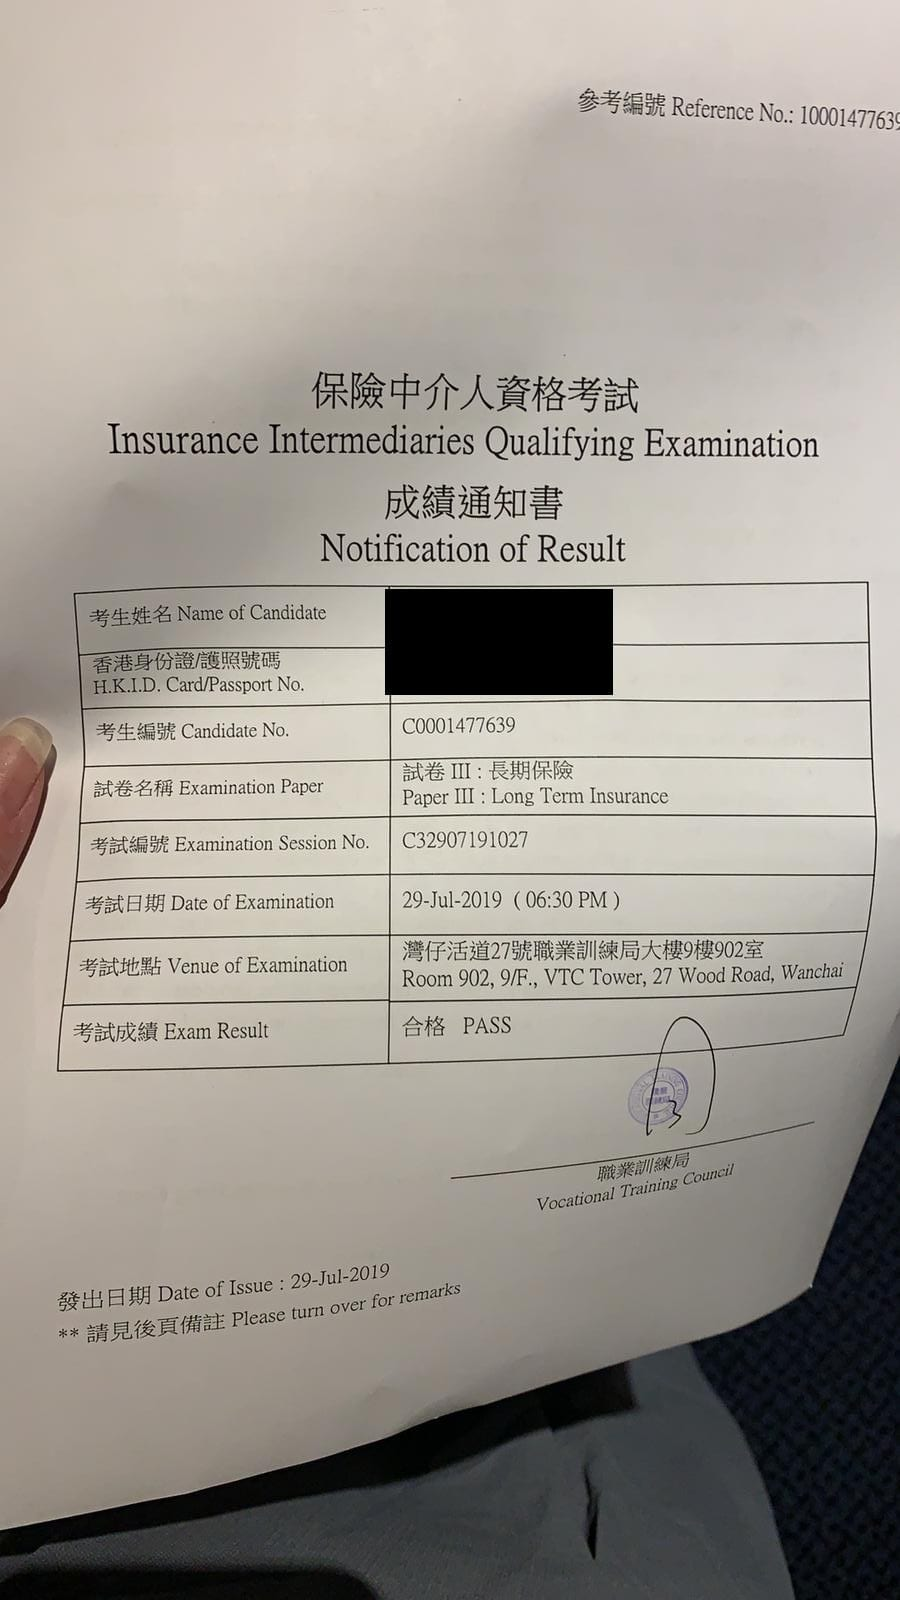 WMC 29/7/2019 IIQE Paper 3 保險中介人資格考試卷三 Pass